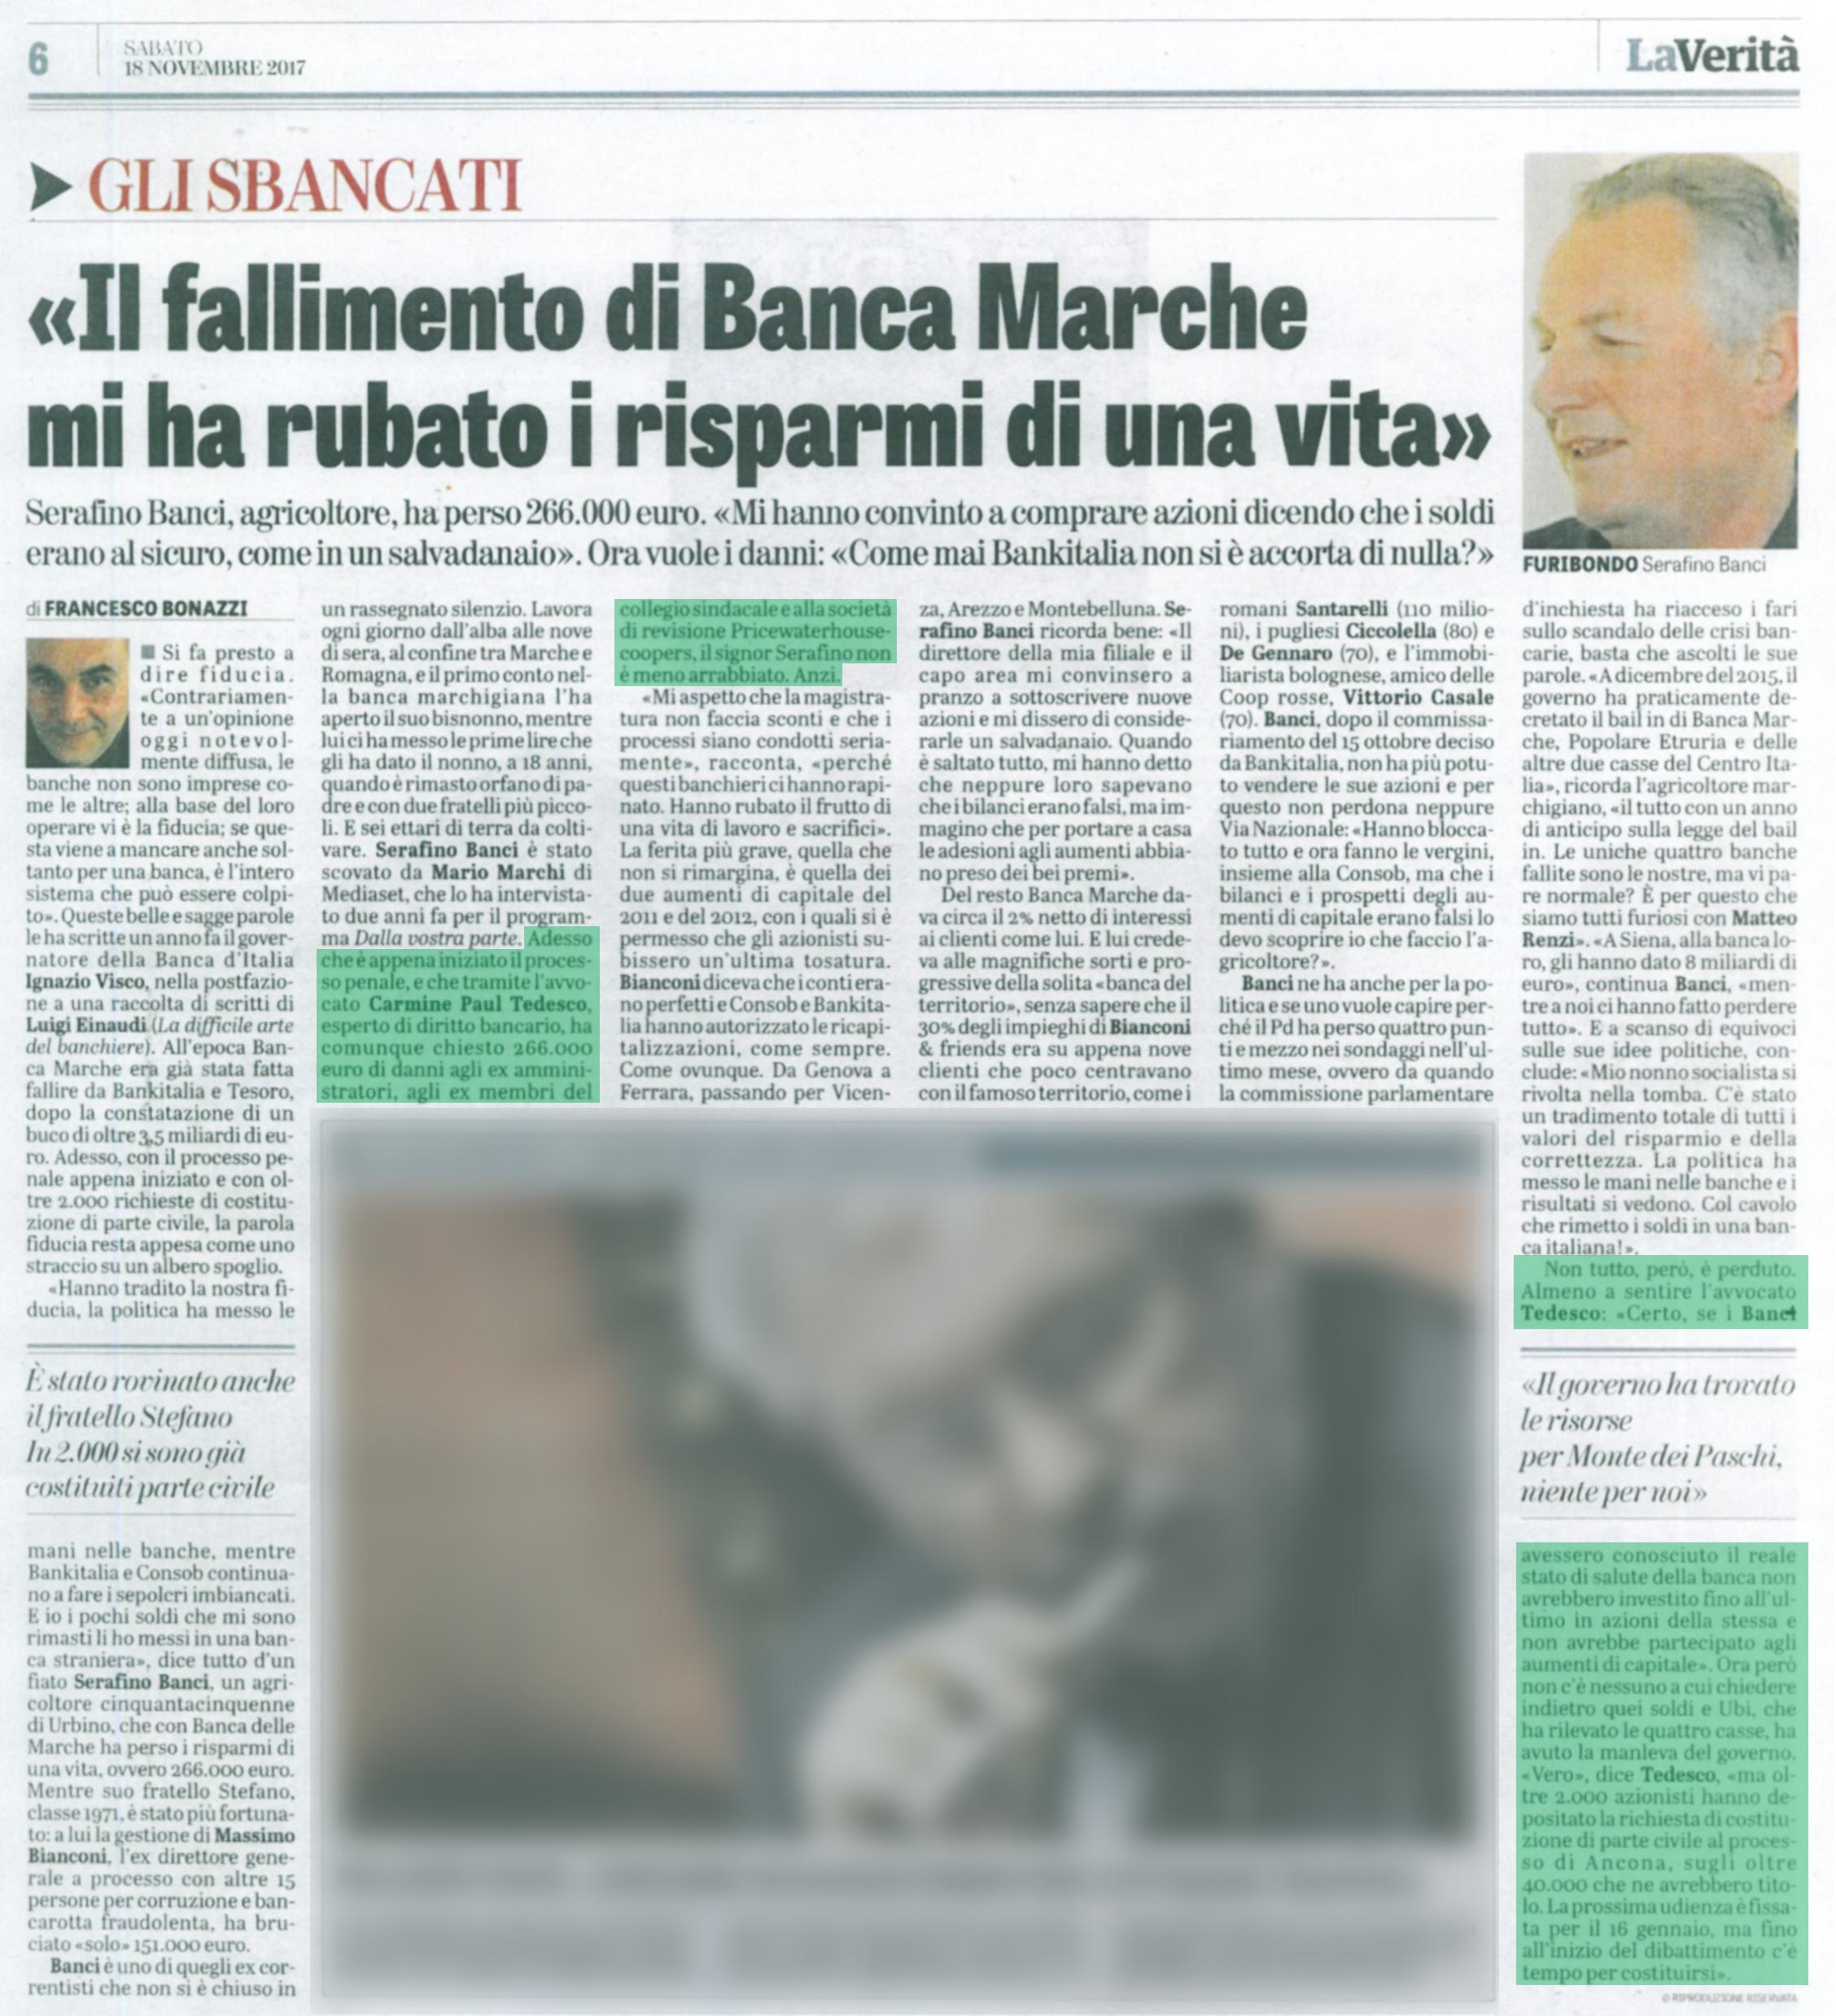 Avvocato Carmine Paul Alexander Tedesco